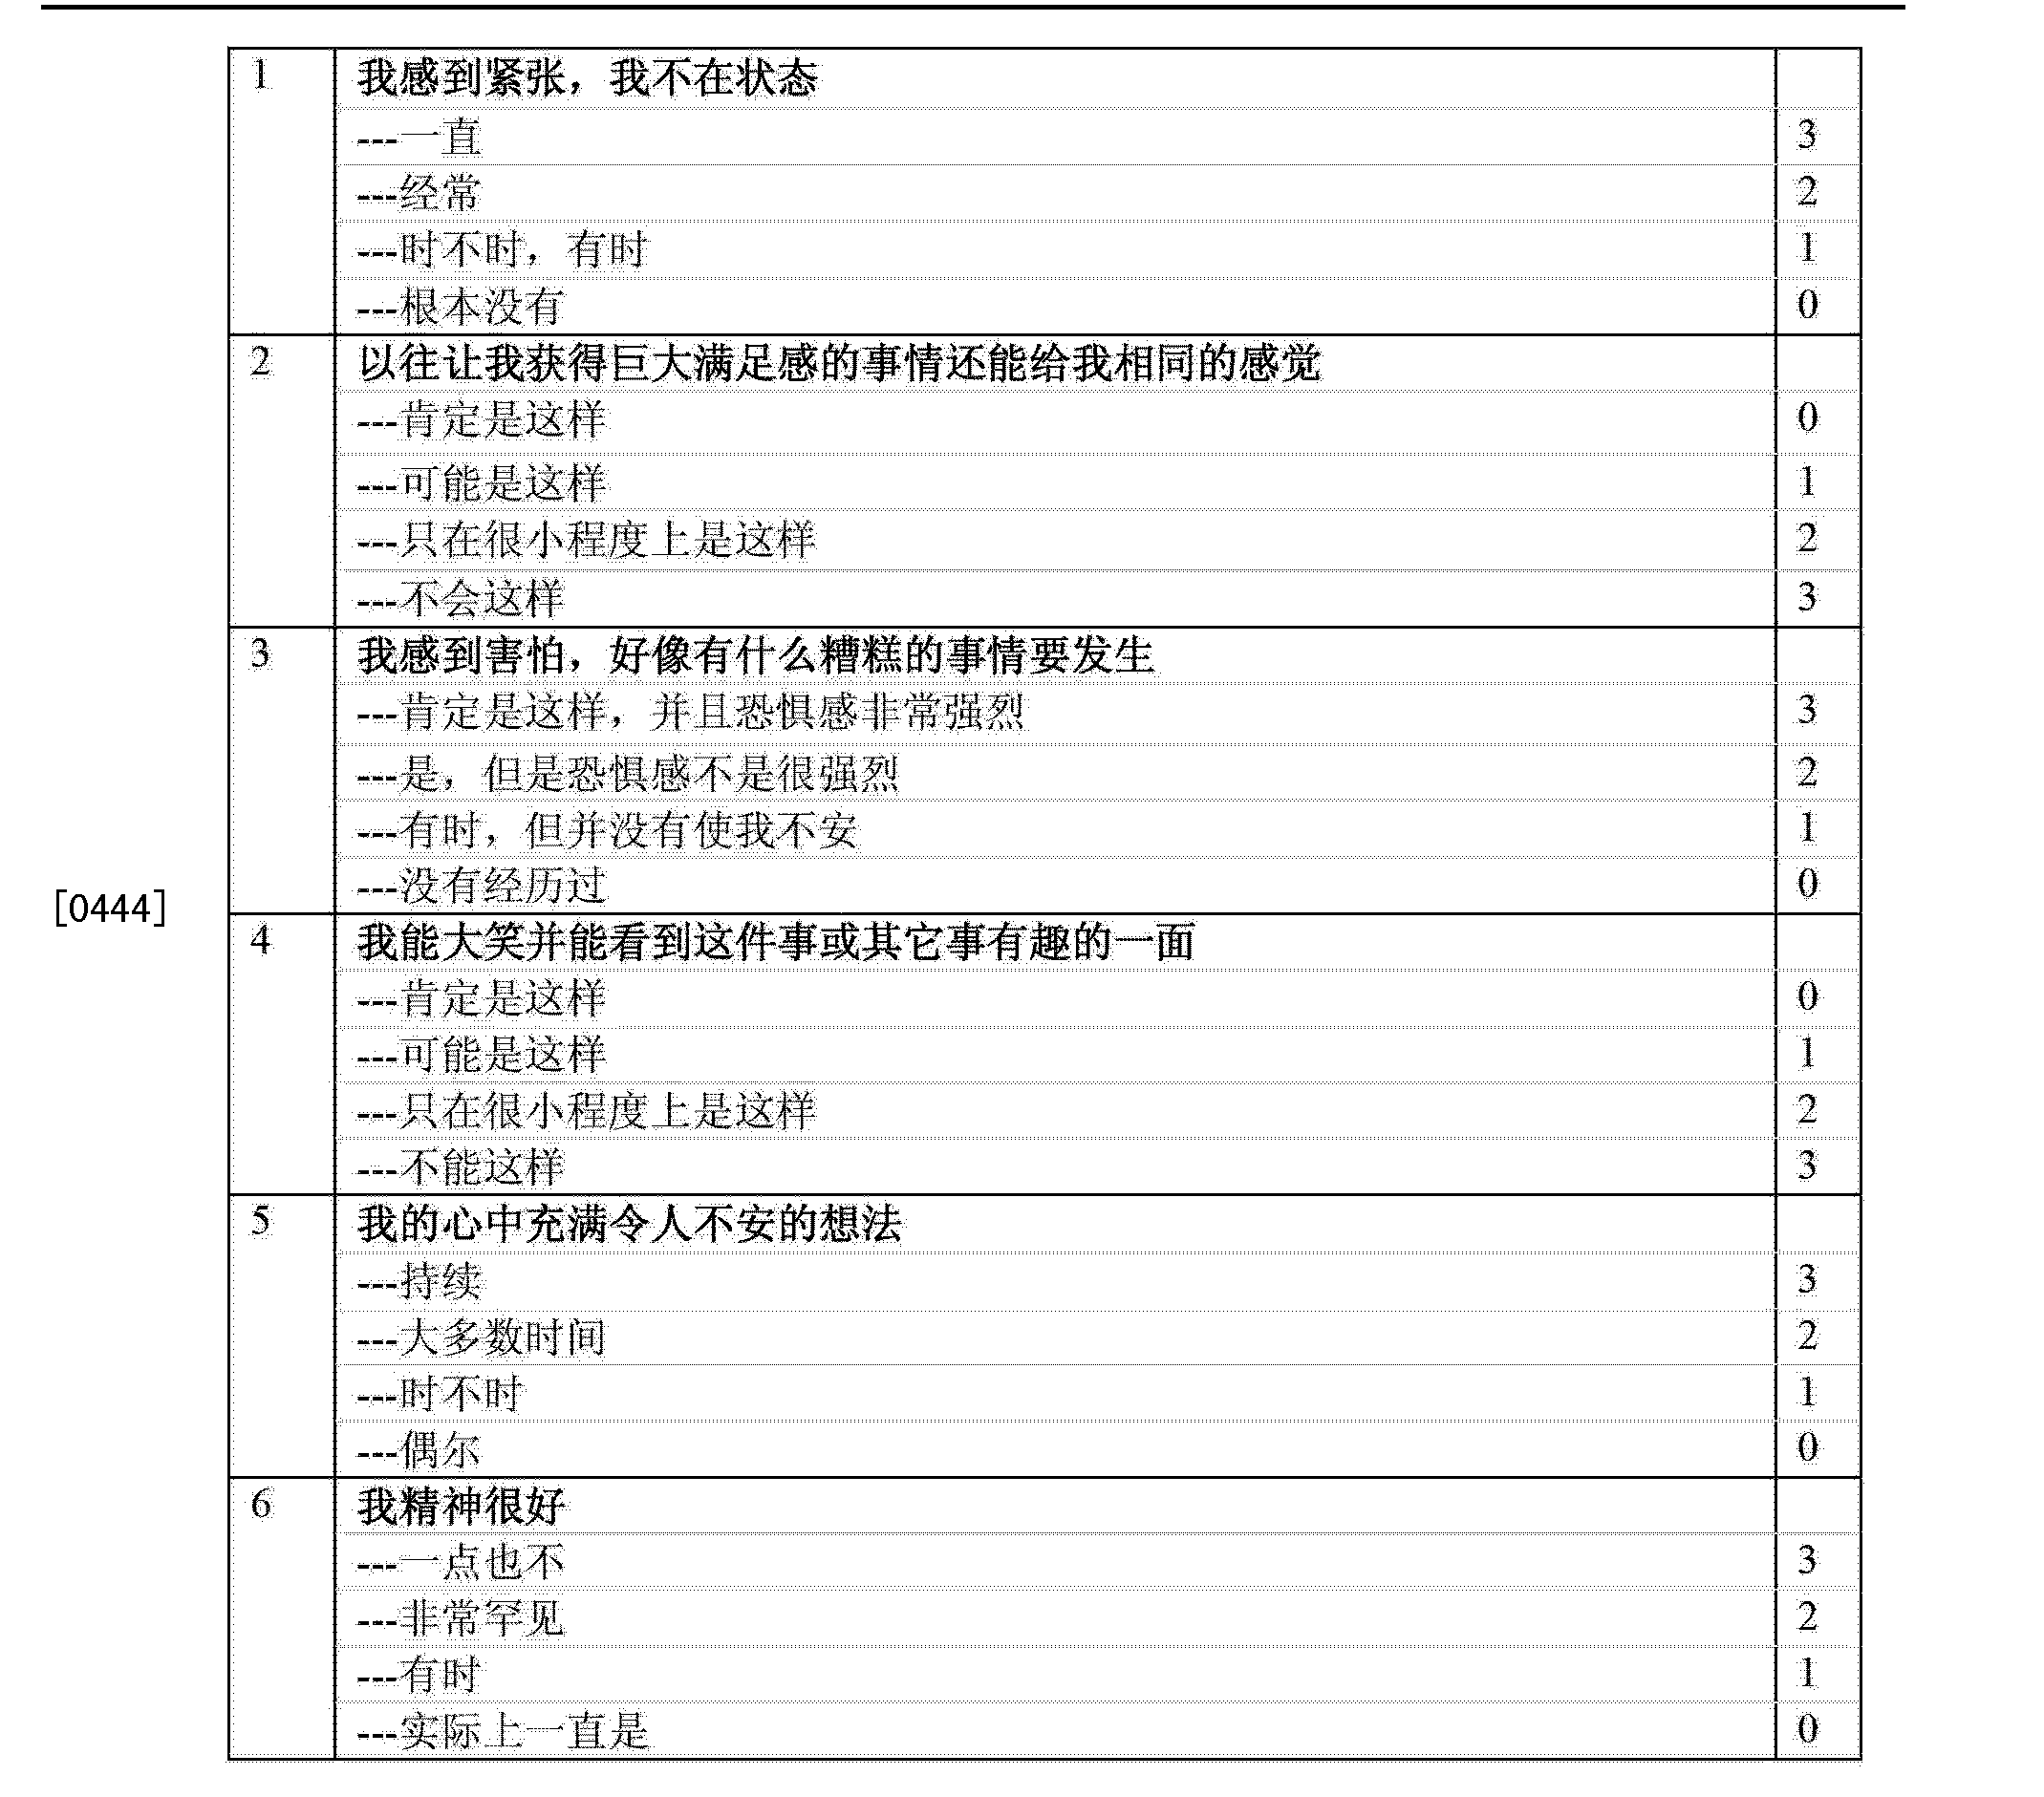 cn103124742a �������������� google patents